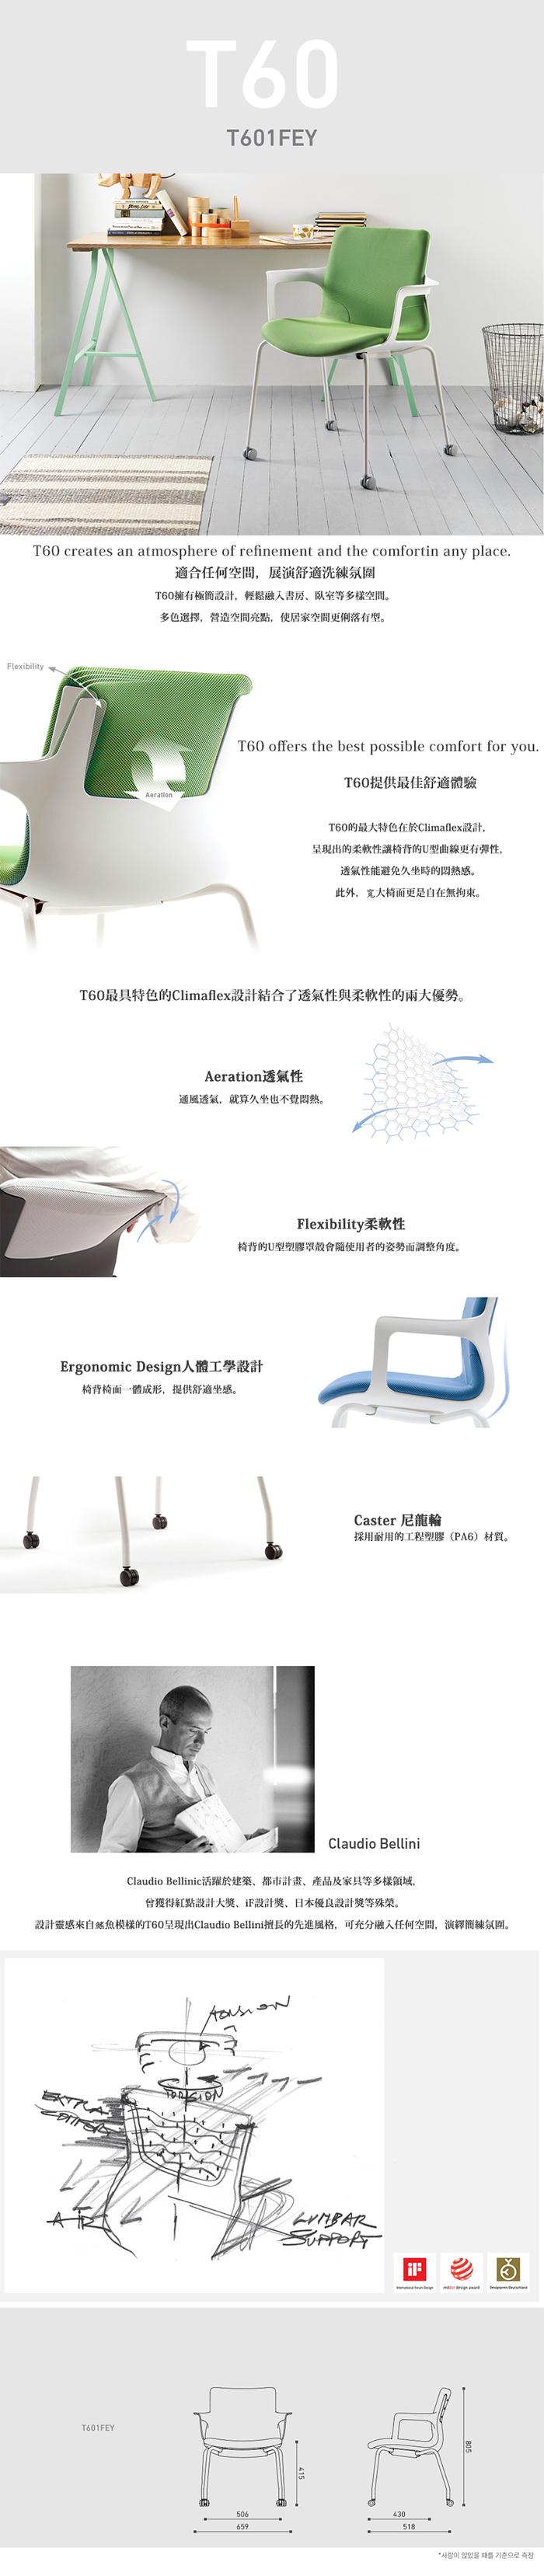 iloom 怡倫家居 SIDIZ Ega T60 設計師系列人體工學時尚椅 椅輪型